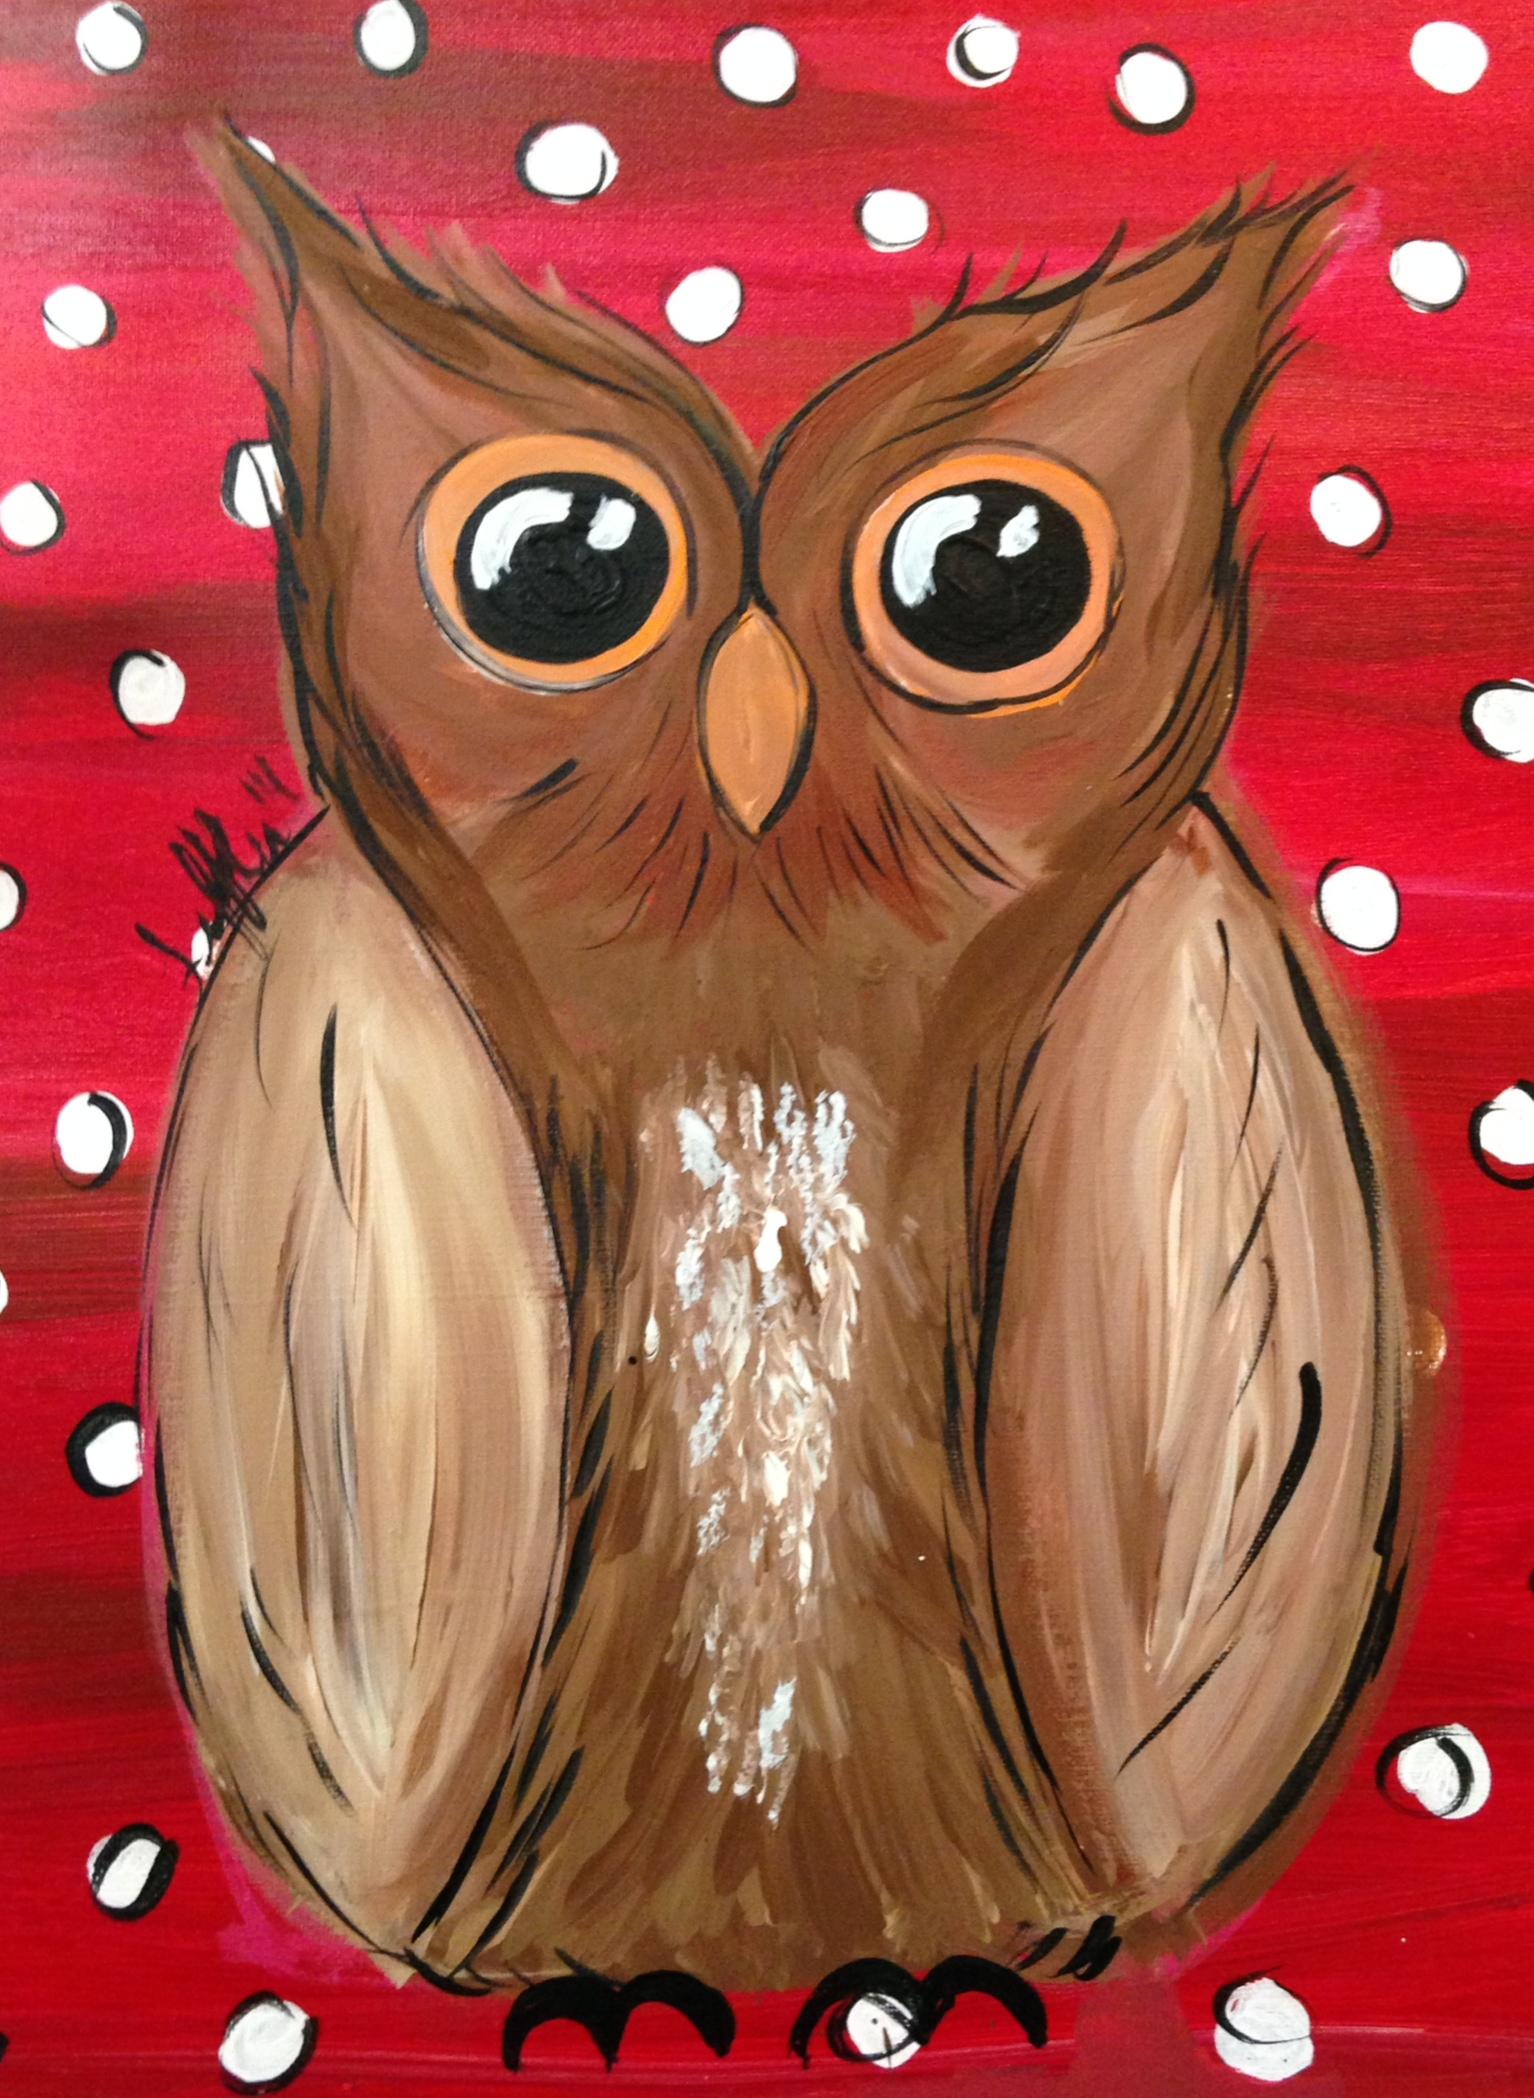 Owl on Red.JPG